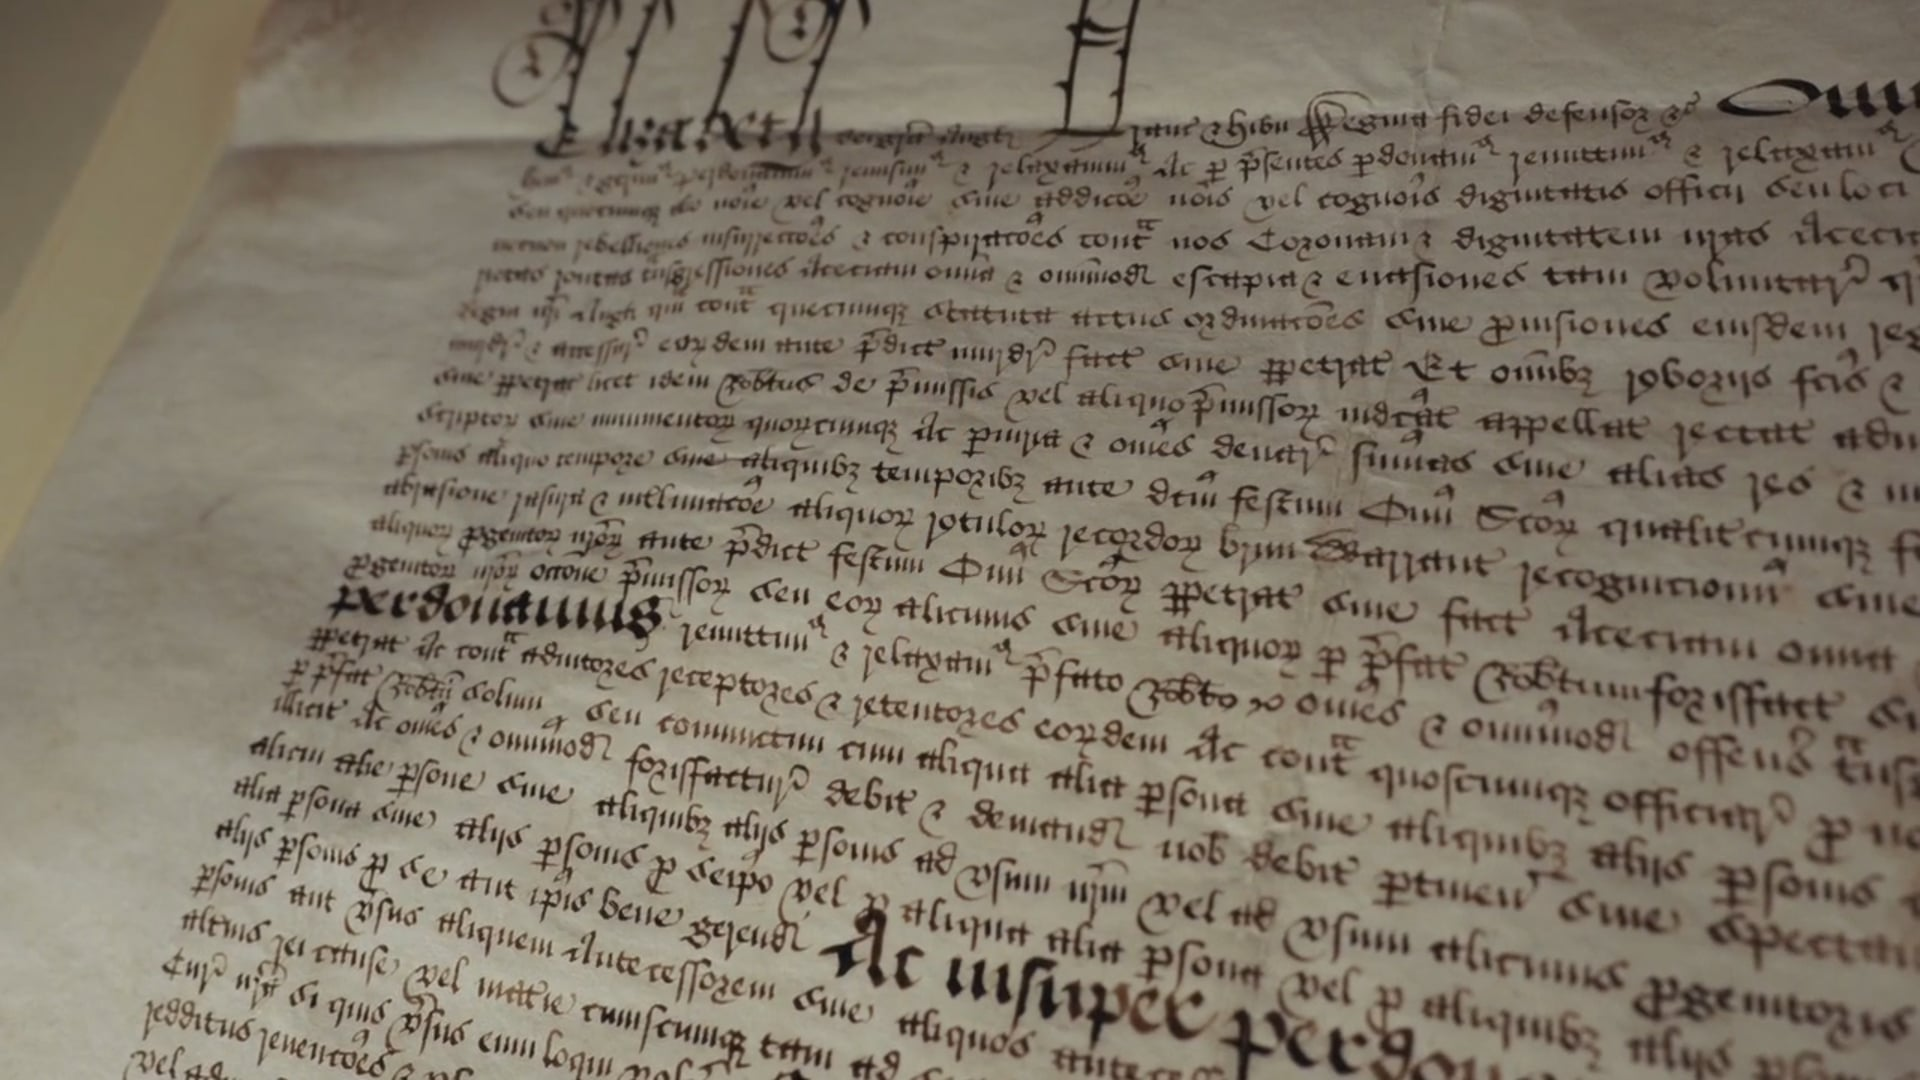 Agecroft's Elizabethan Pardon